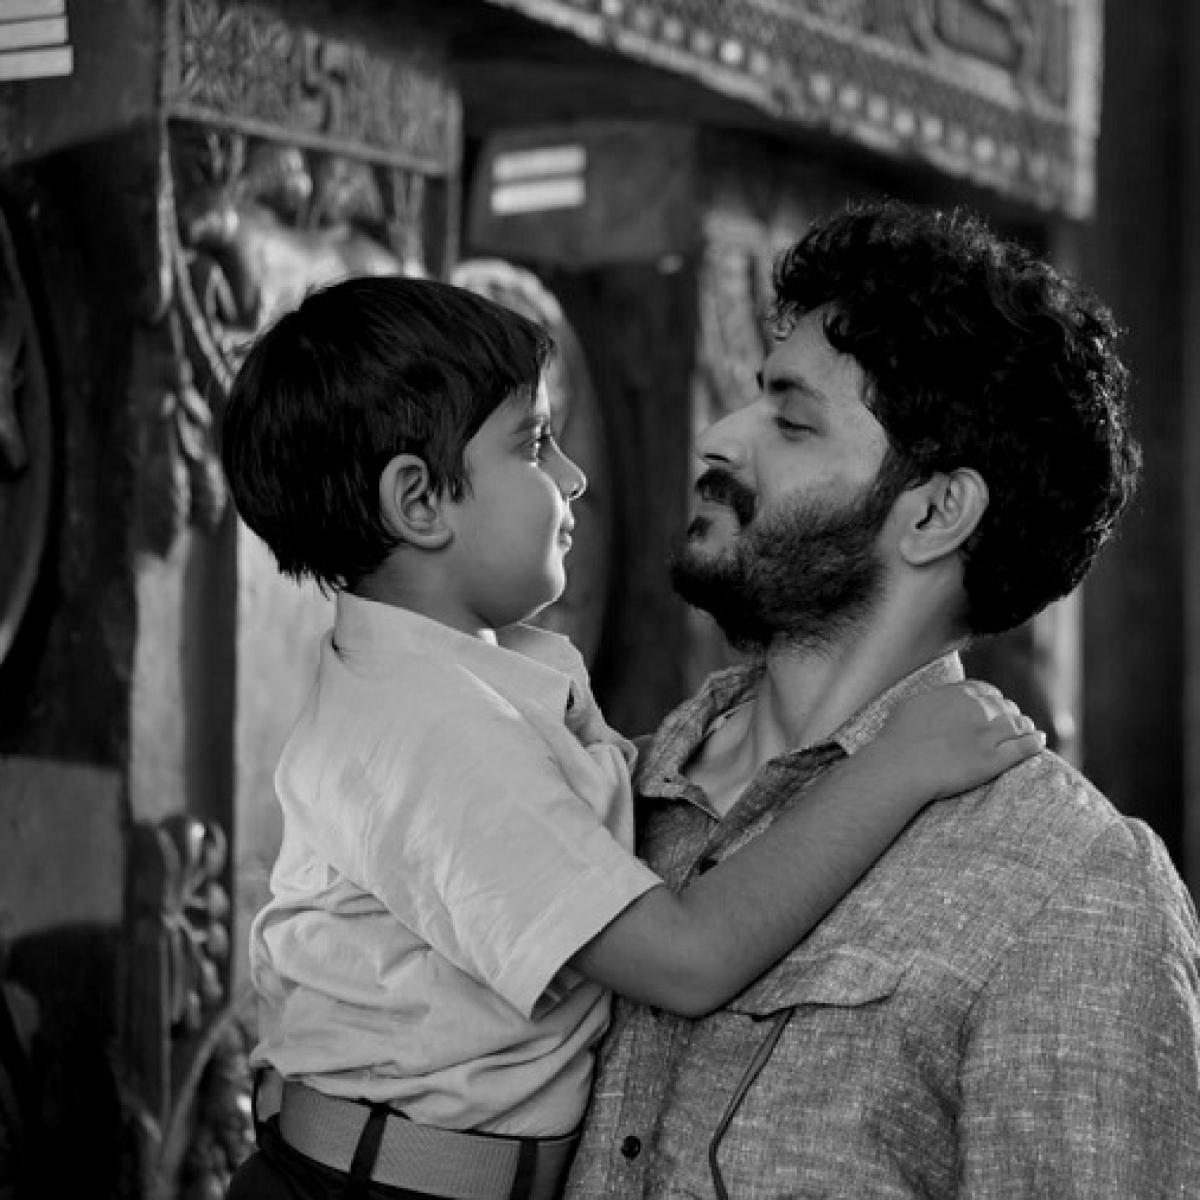 Satyajit Ray's Apu Trilogy finds closure with director Subhrajit Mitra's Avijatrik: The Wanderlust of Apu